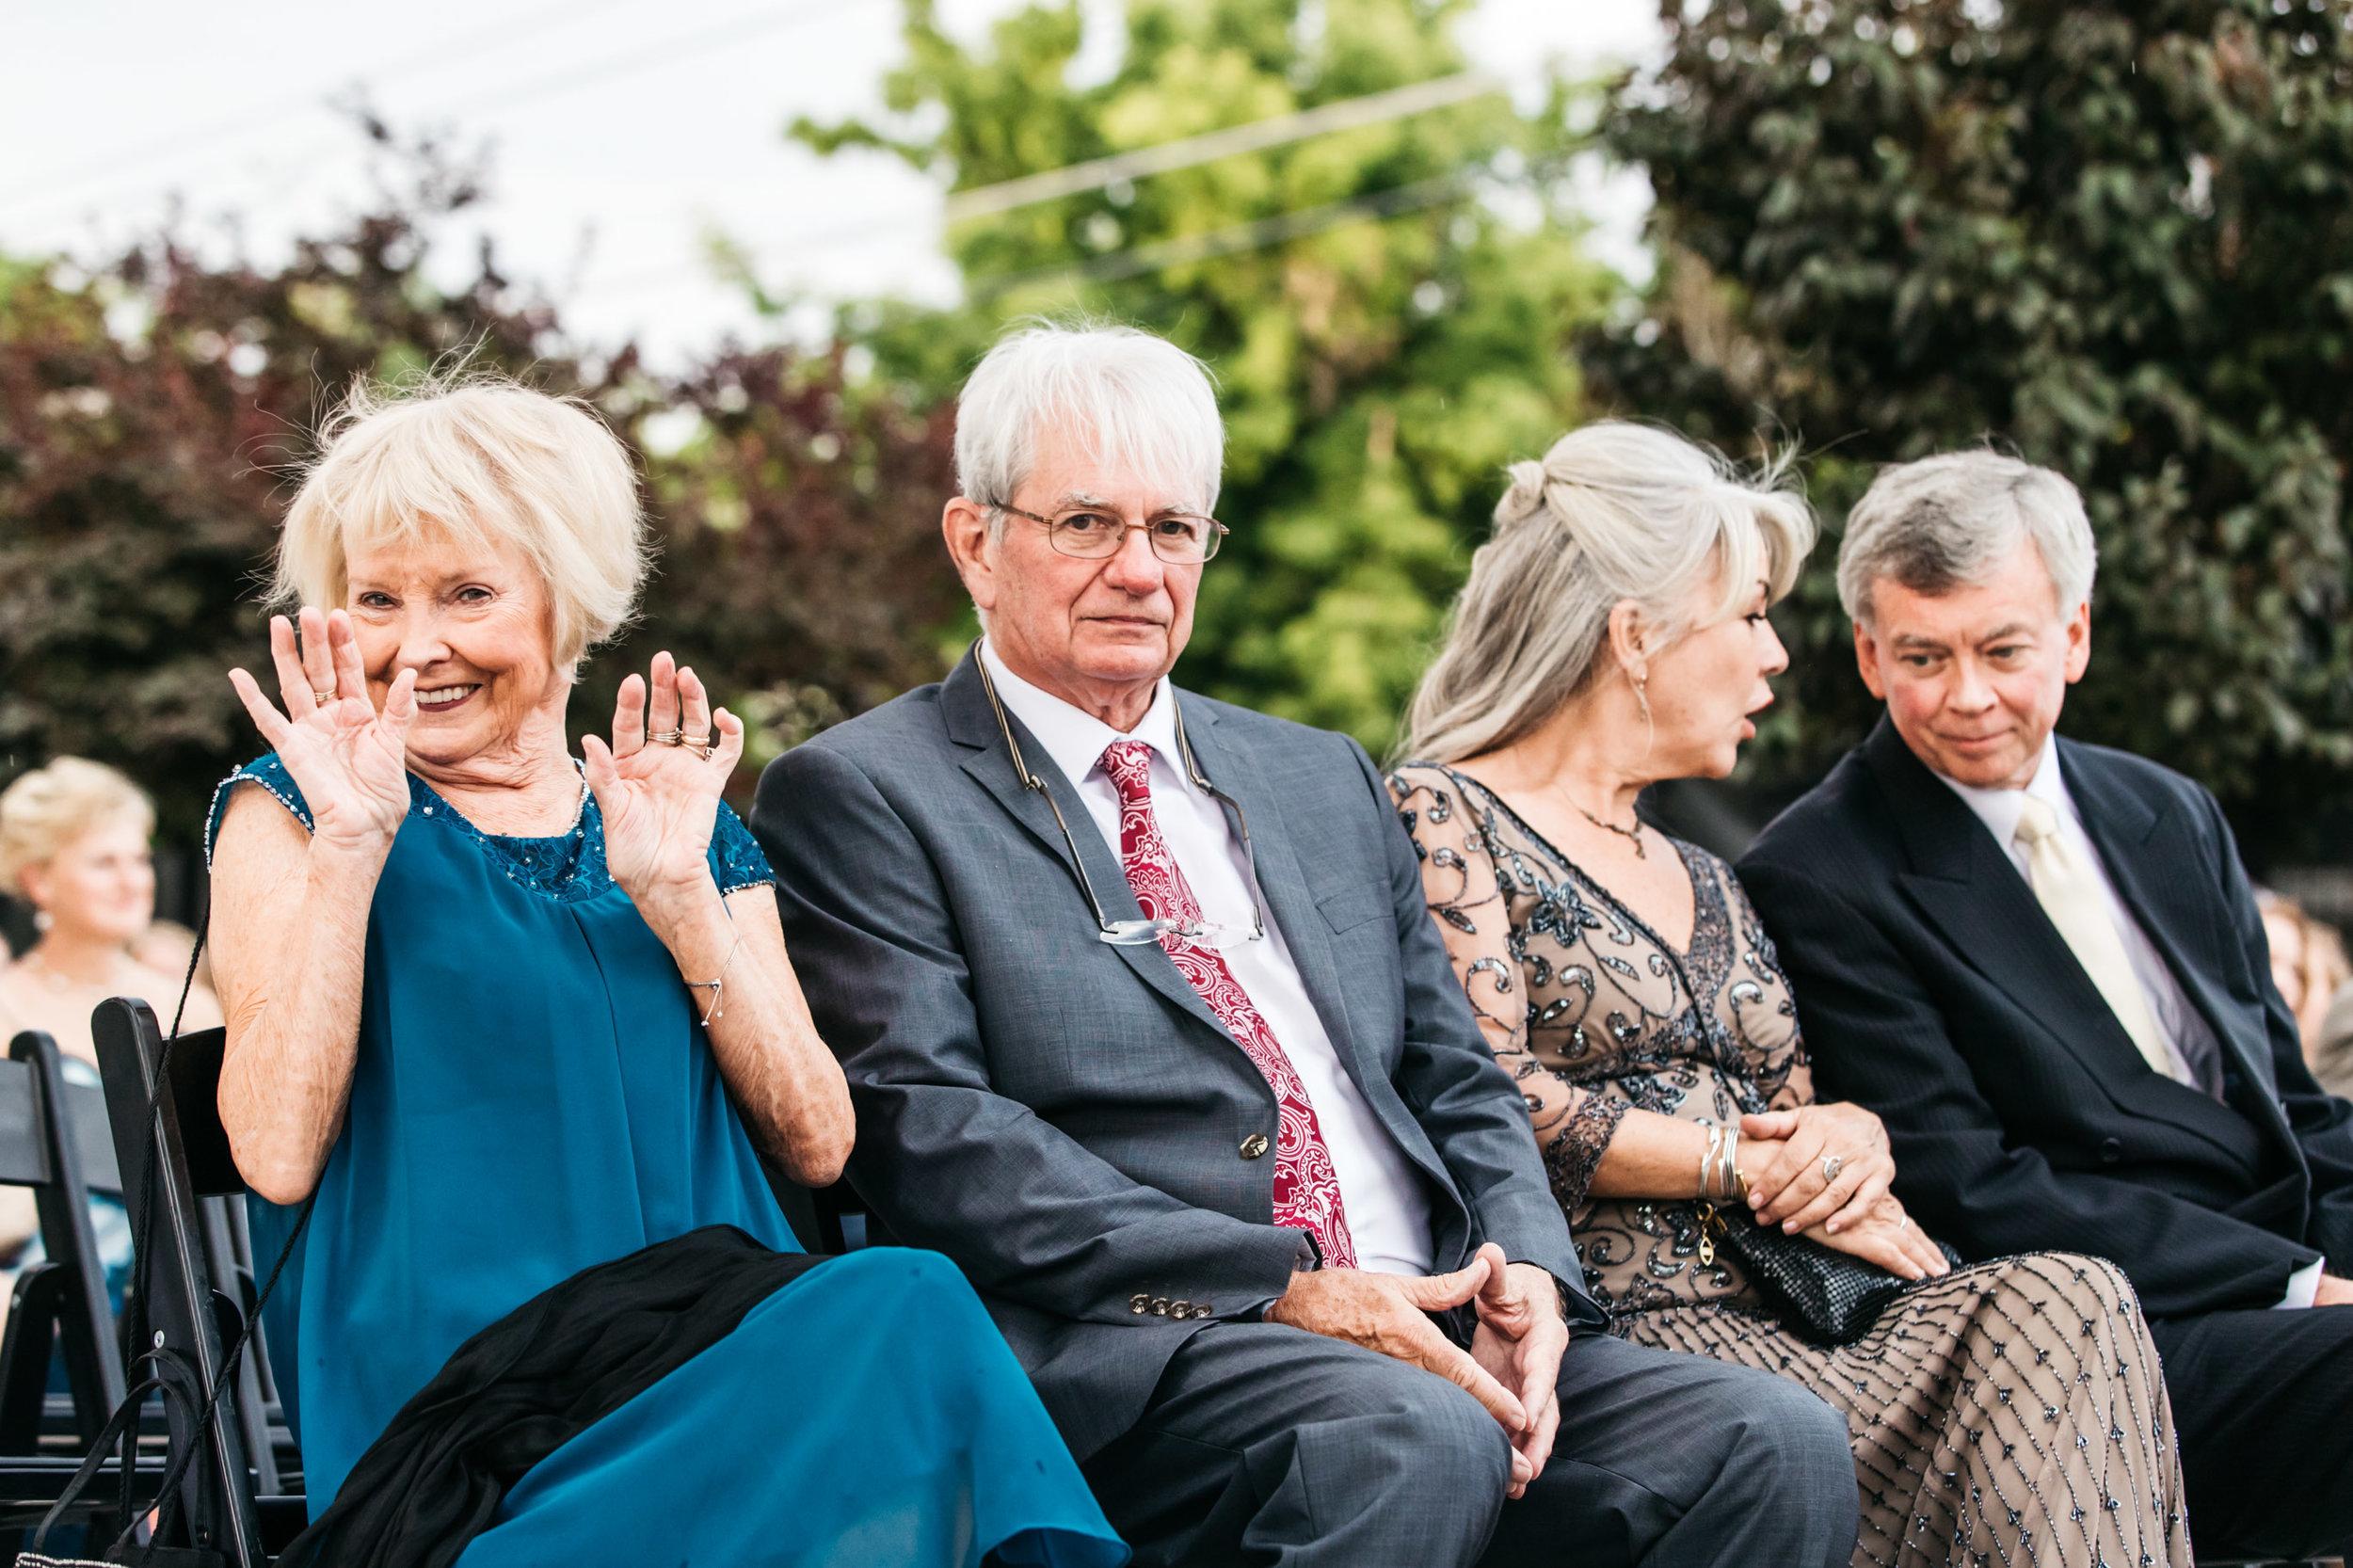 Funny Grandma wedding ceremony